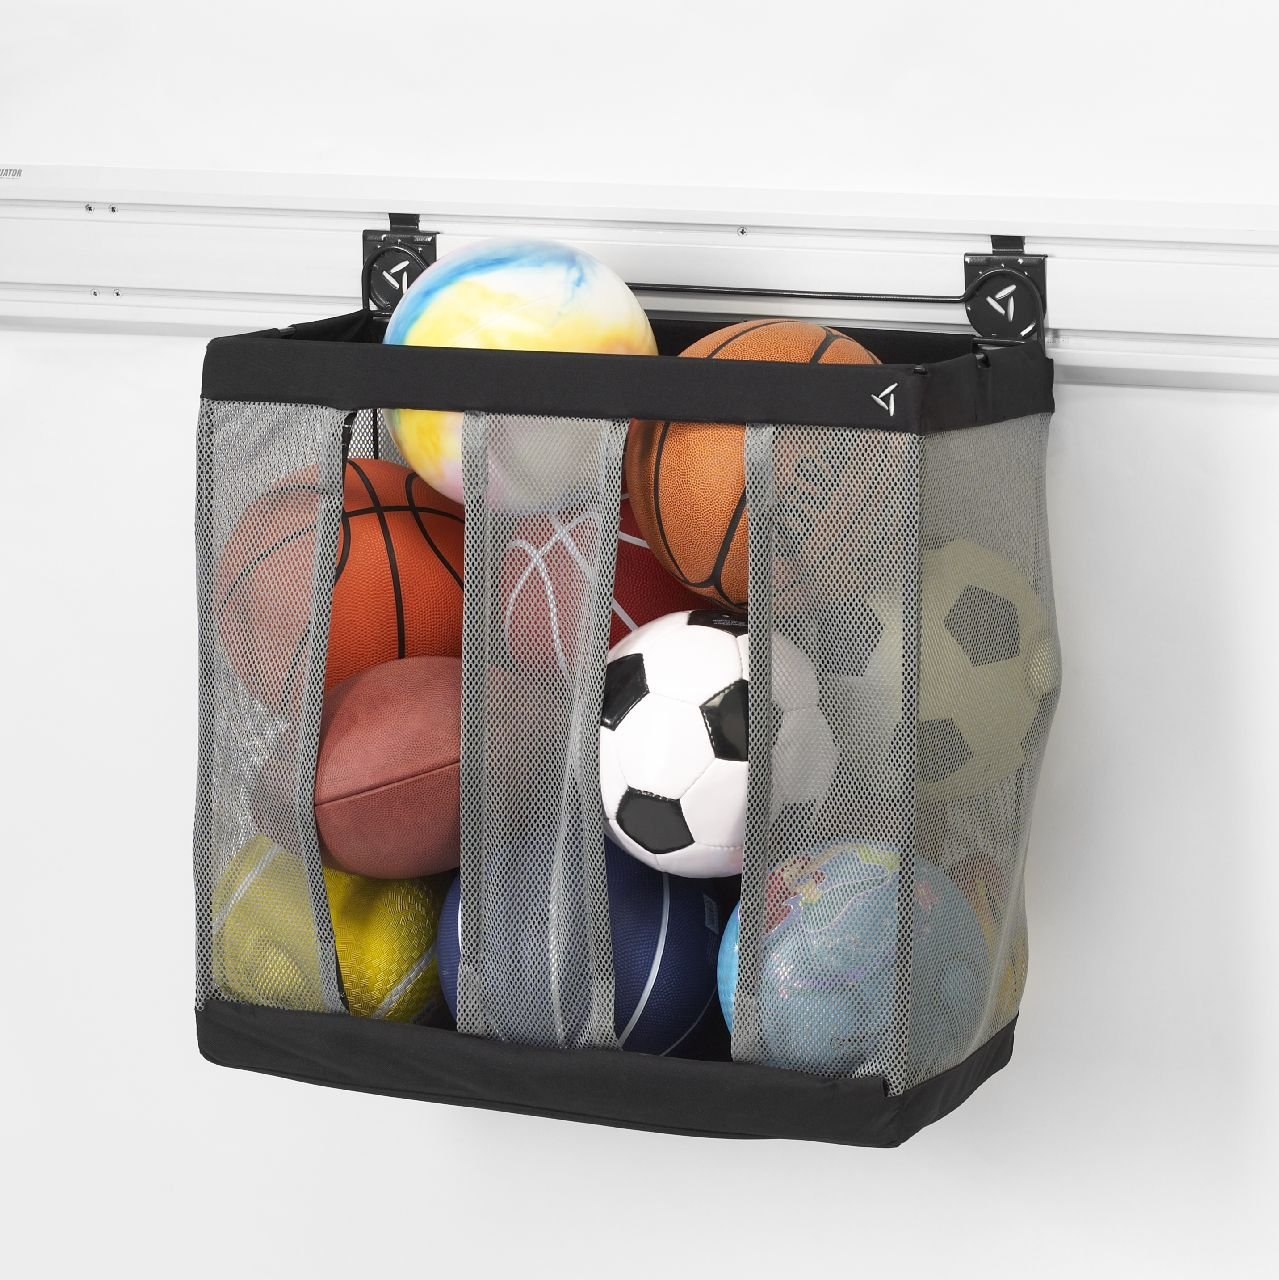 Amazon.com: Gladiator GarageWorks GAWUXXBLTH Ball Caddy: WHIRLPOOL: Home  Improvement